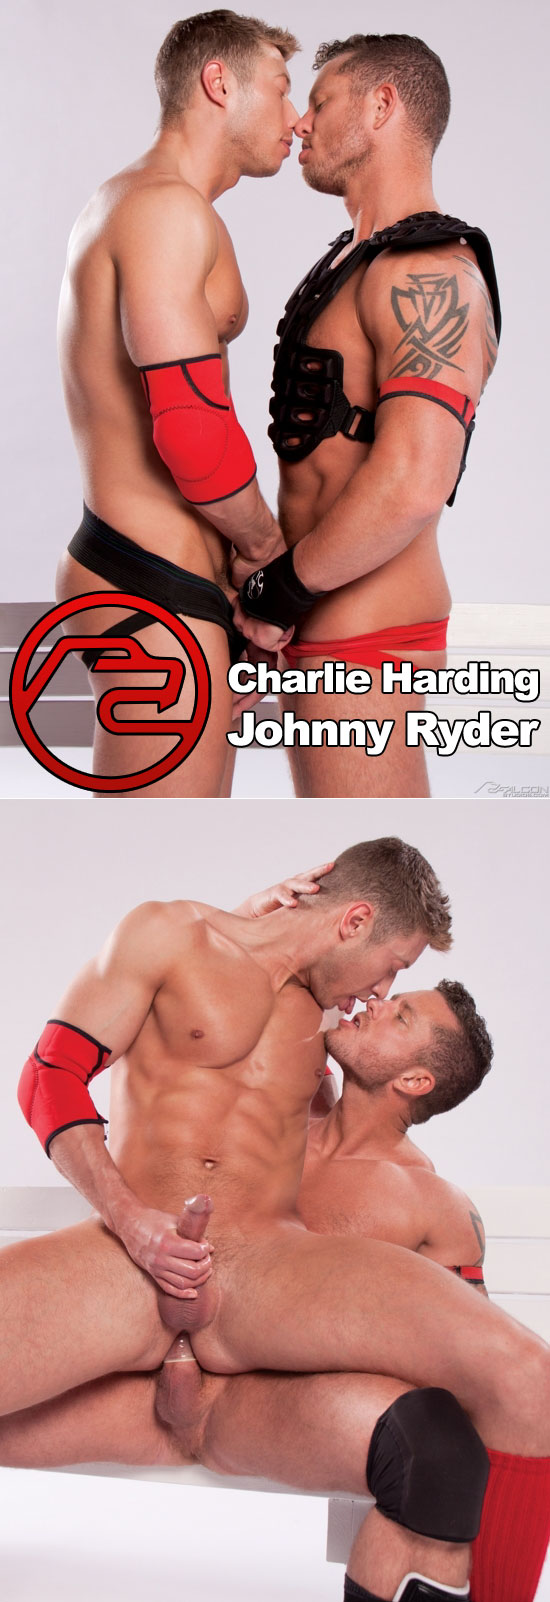 Charlie Harding fucks Johnny Ryder